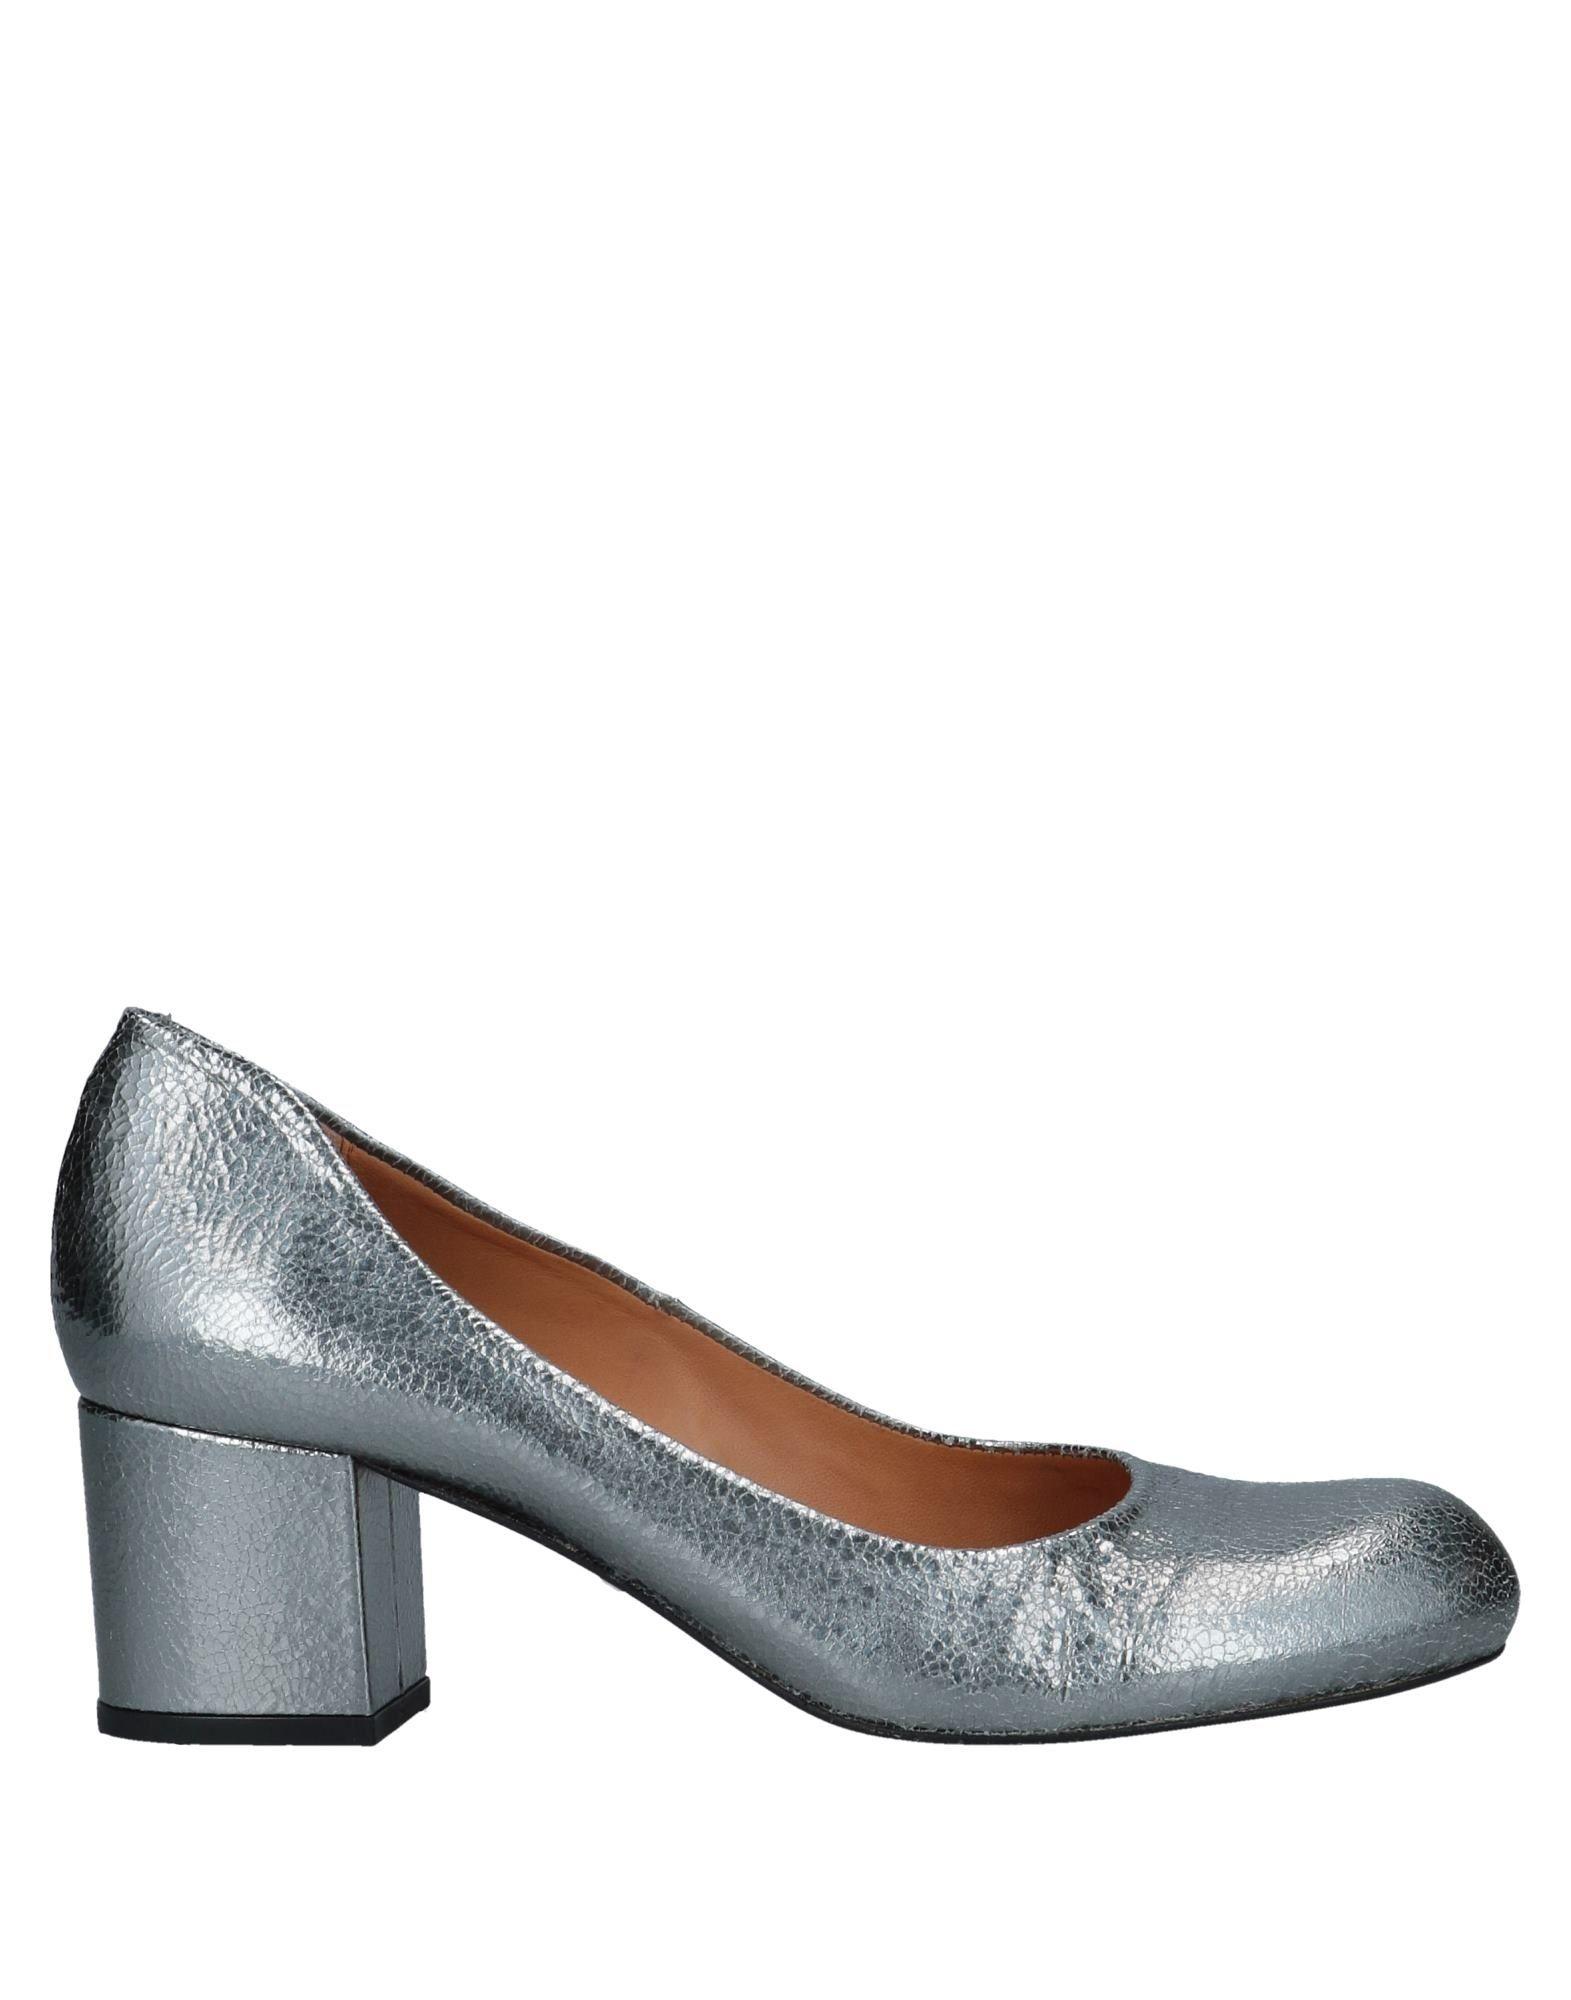 Gran descuento Zapato De Salón Audley Mujer Mujer Mujer - Salones Audley  Plata 9be1cc